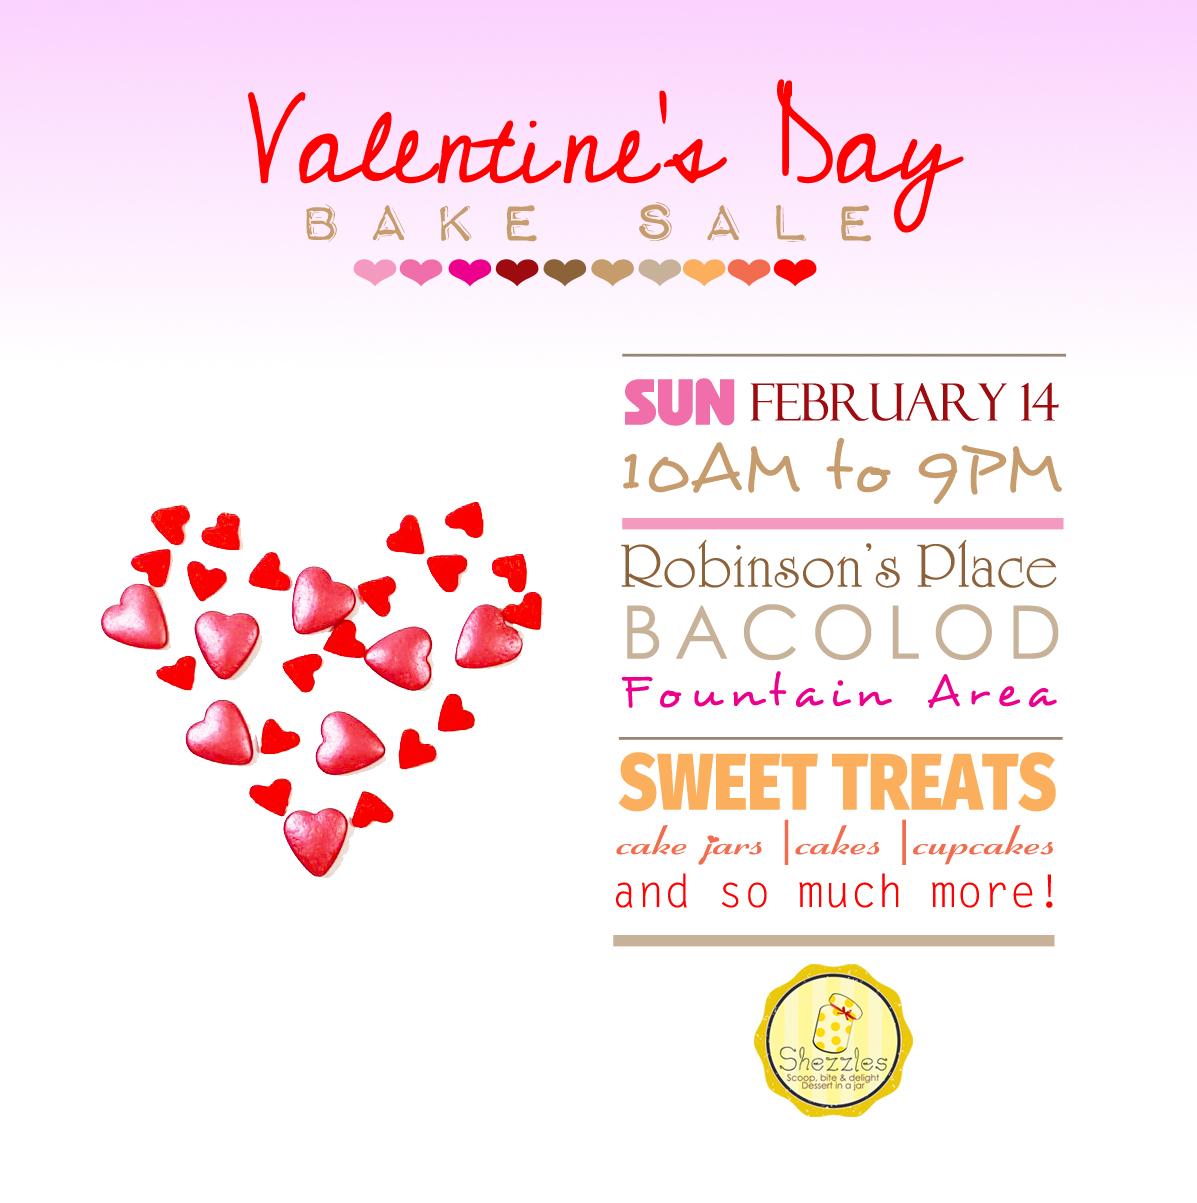 Shezzles Dessert In A Jar Valentine S Day Bake Sale